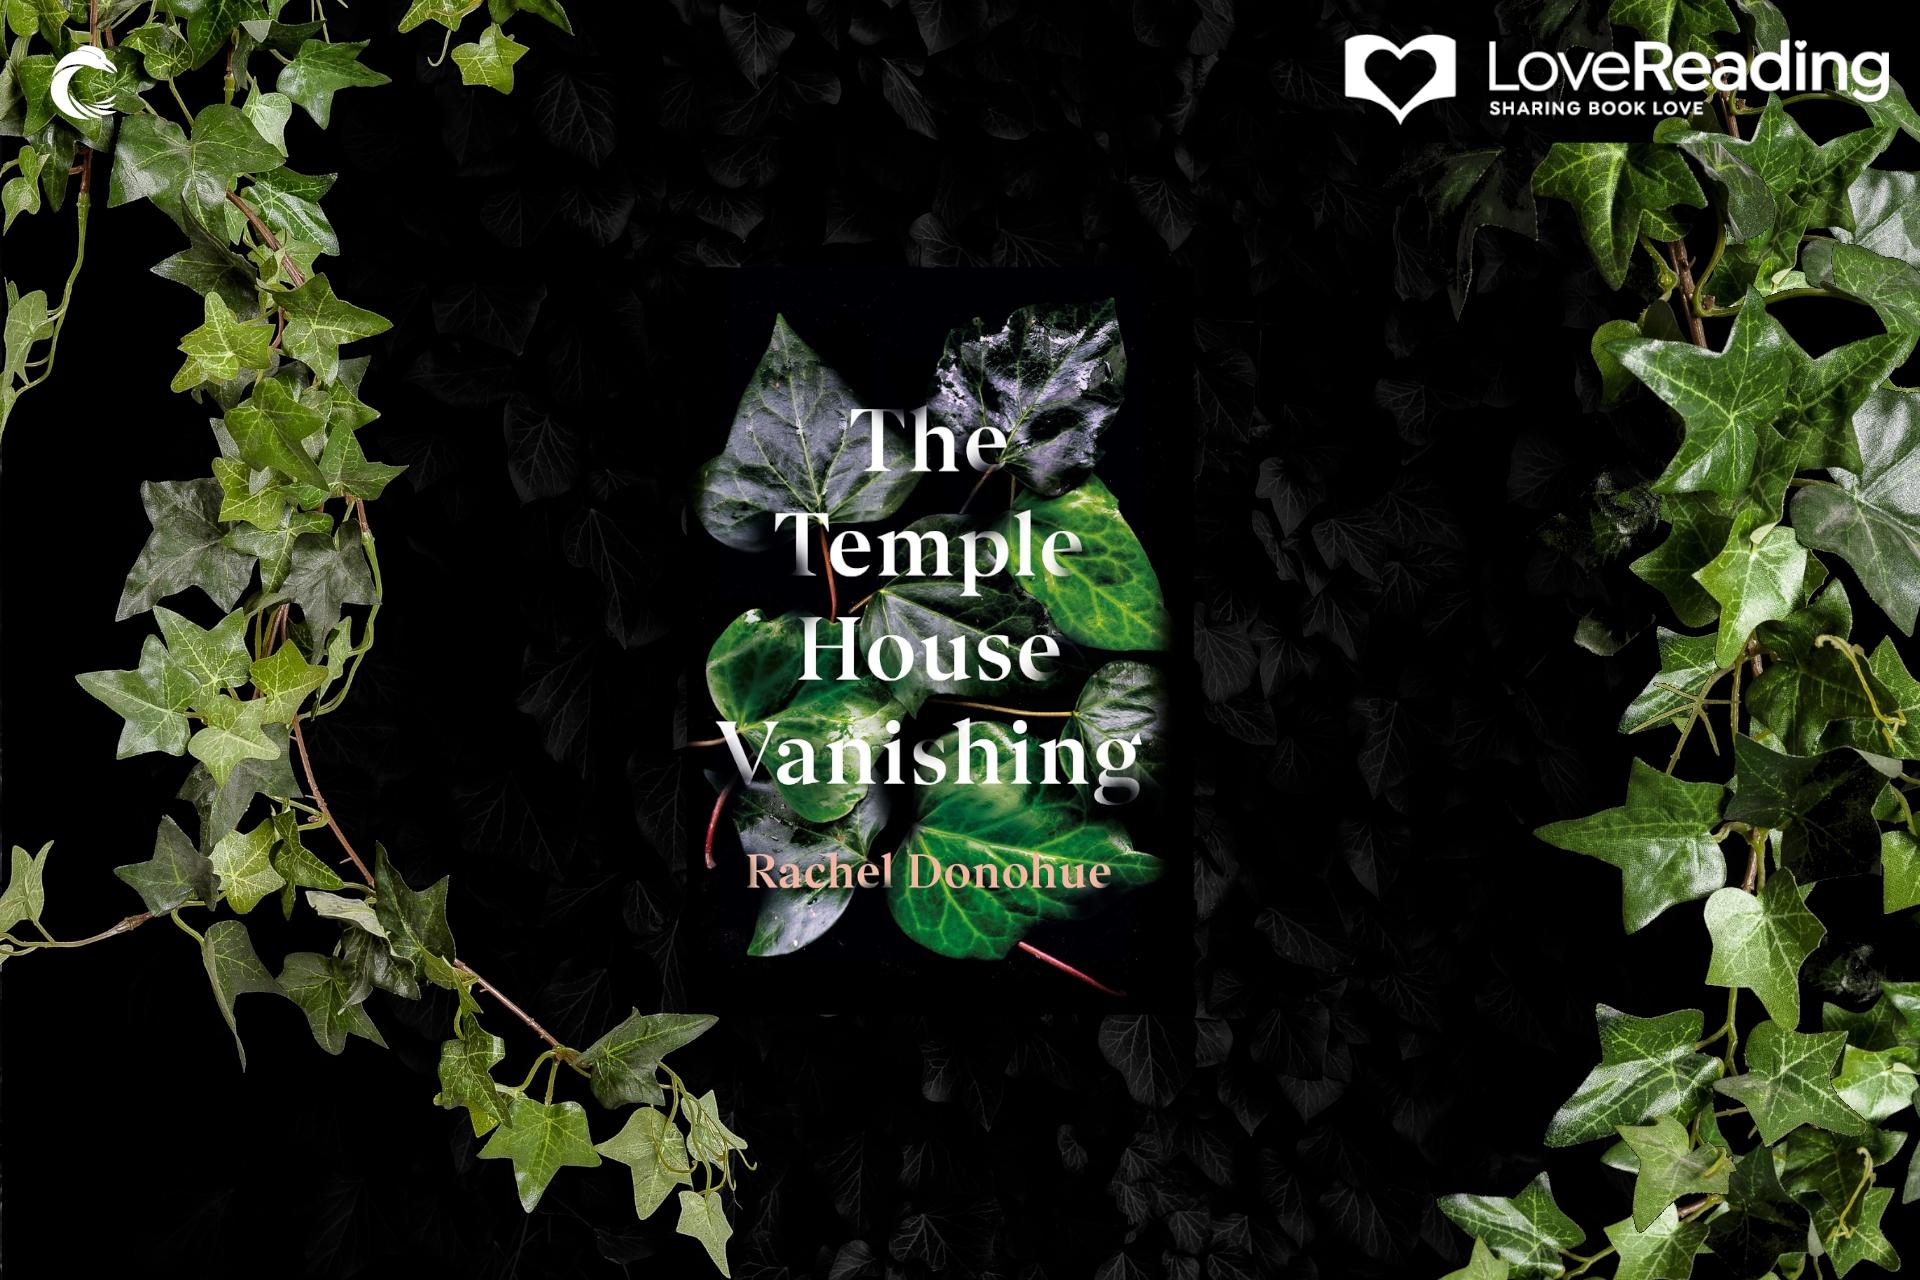 Ambassador Book Buzz: The Temple House Vanishing By Rachel Donohue